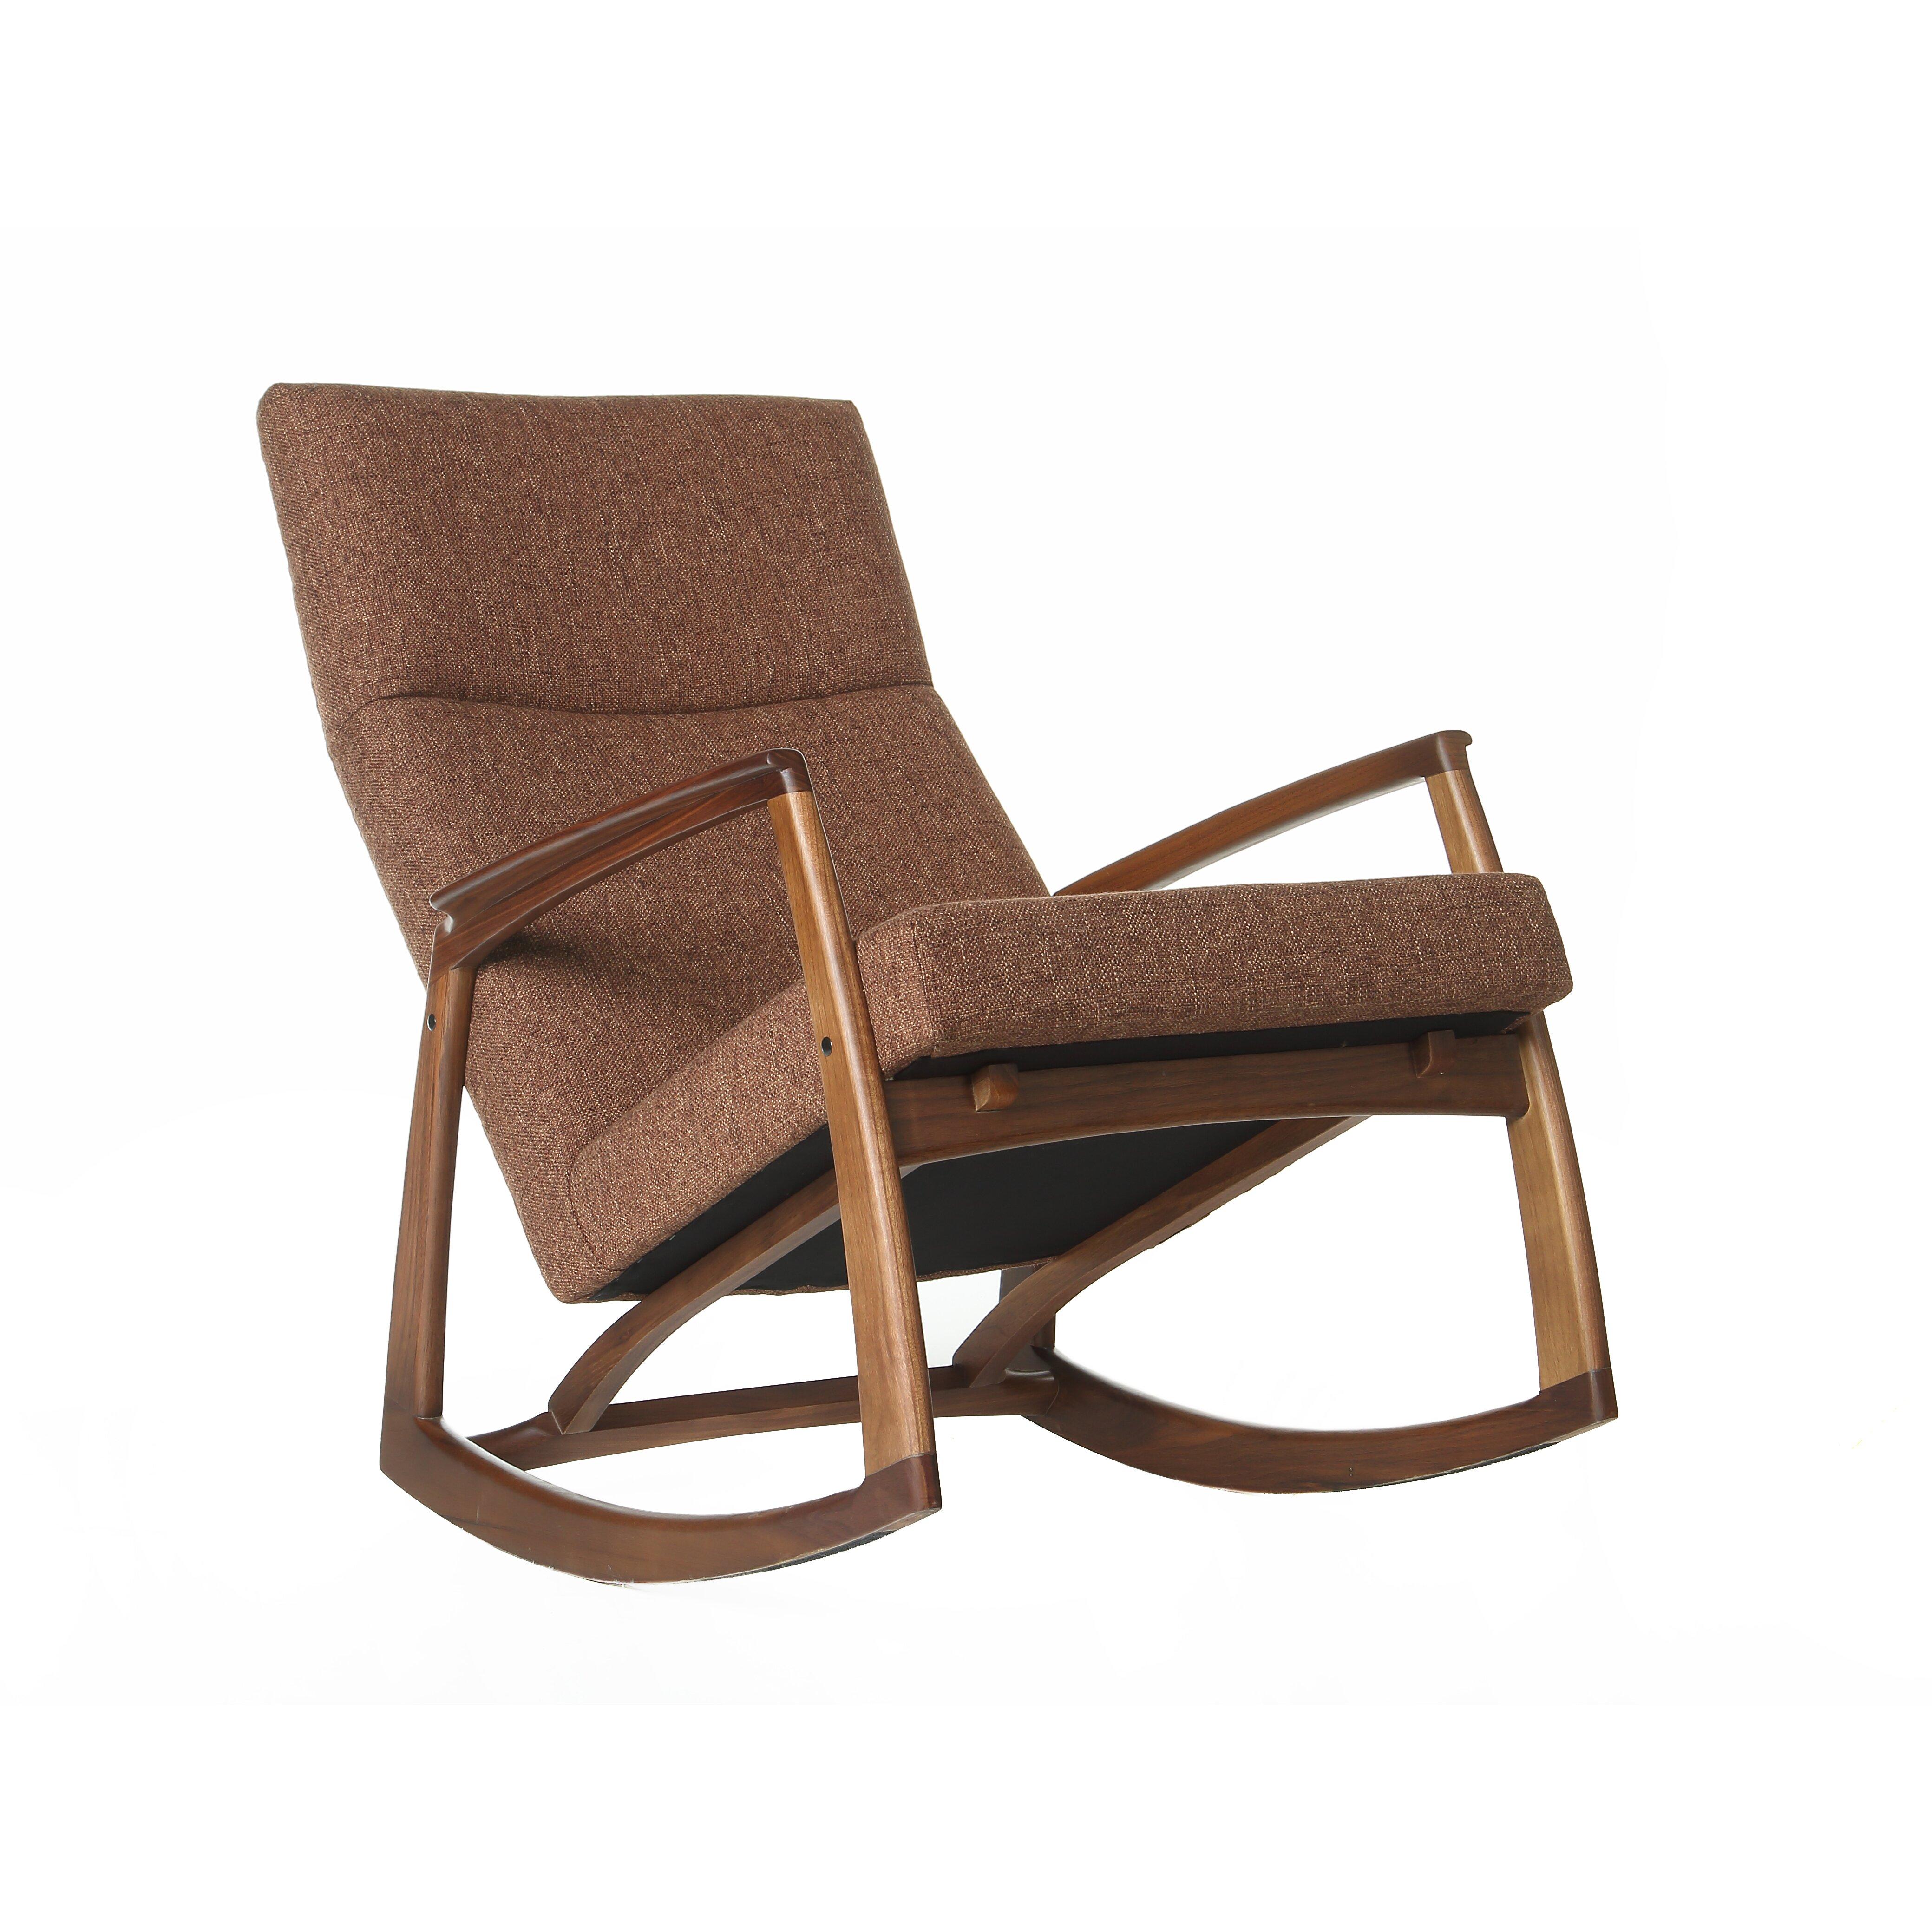 Design tree home hans wegner style rocking chair wayfair - Hans wegner style chair ...